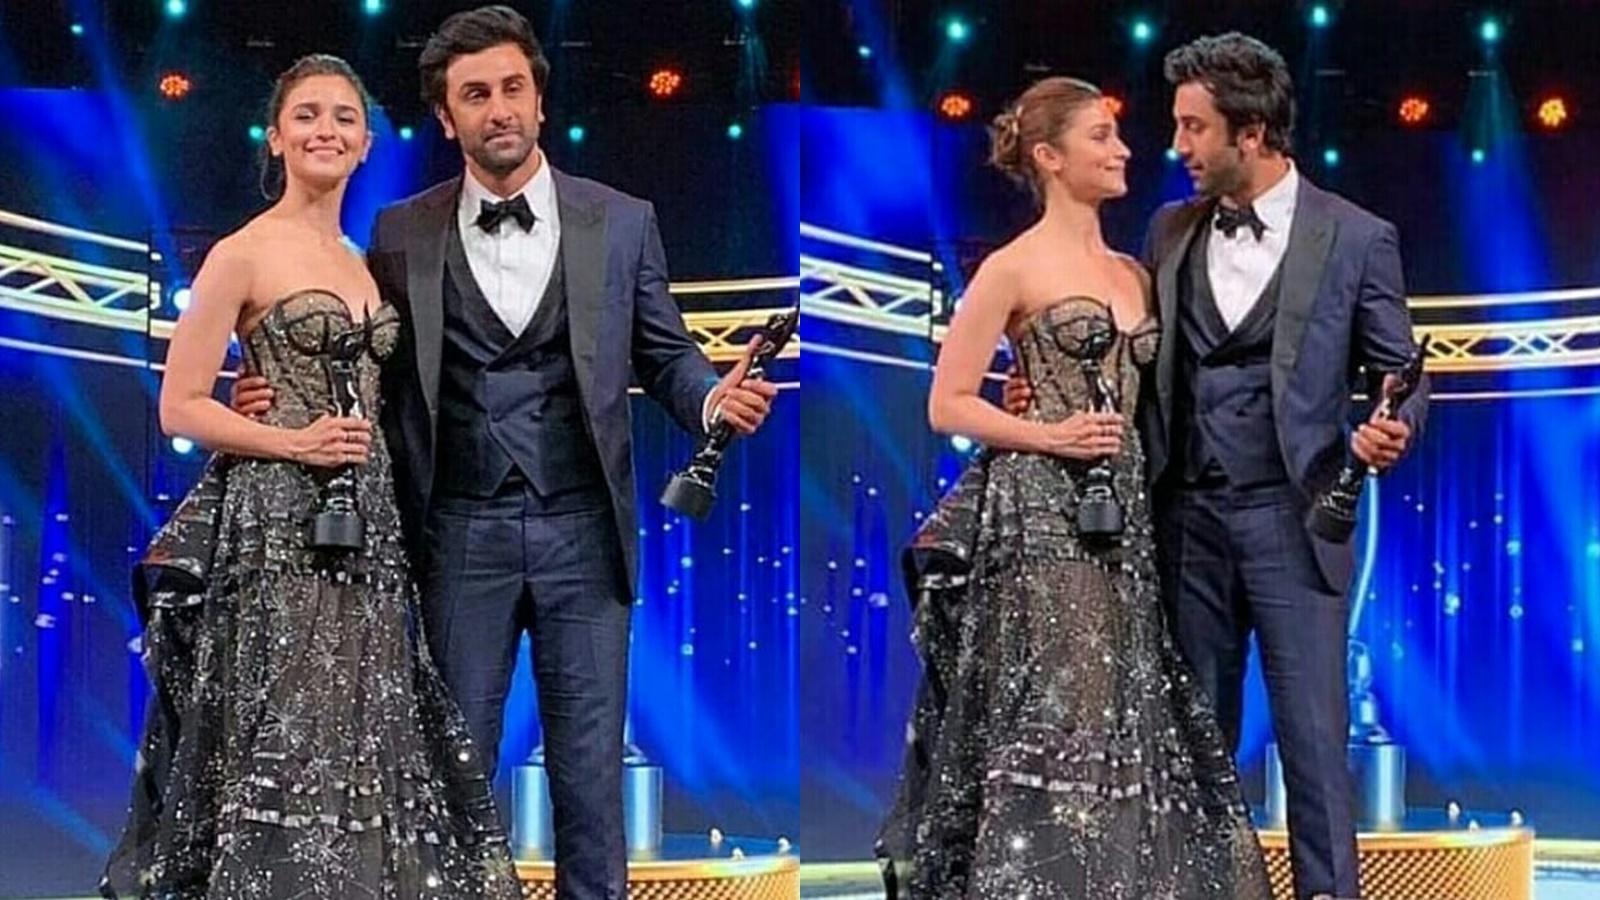 64th Vimal Elaichi Filmfare Awards 2019: Alia Bhatt says 'I love you' to  Ranbir Kapoor